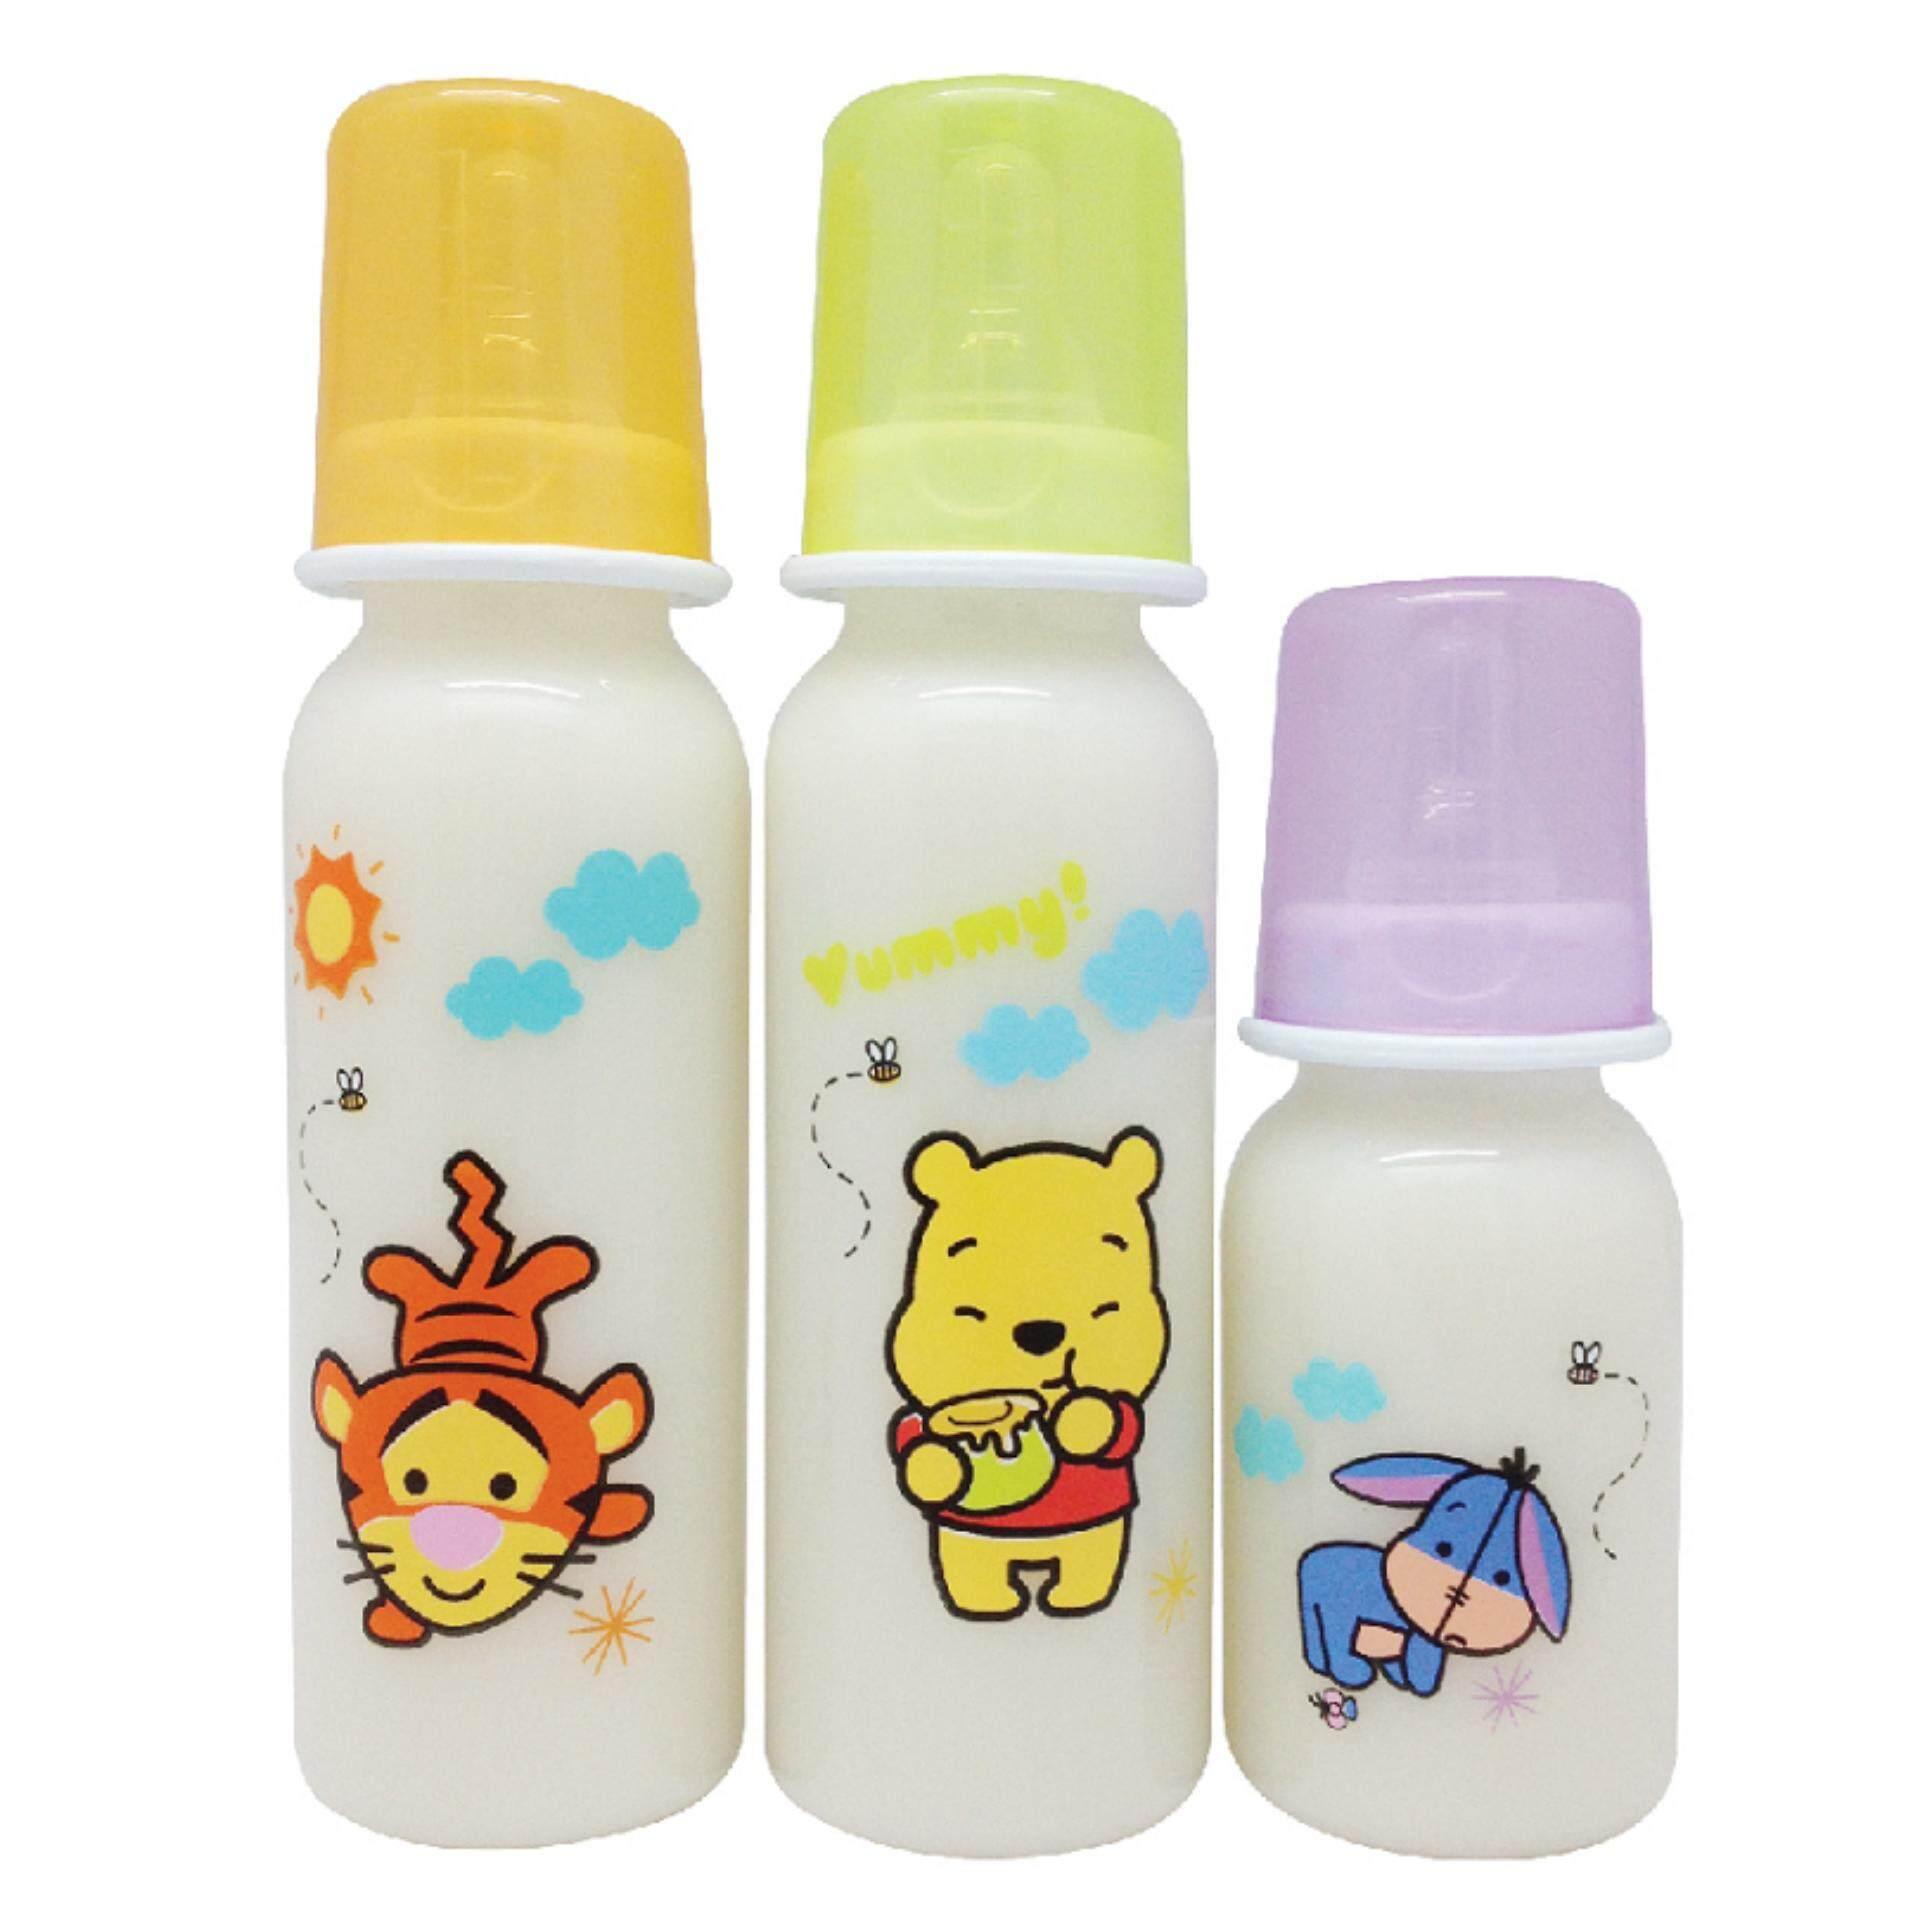 a671b0a7859a Disney Baby 4OZ + 8OZ + 8OZ Round Bottle Set - Winnie The Pooh